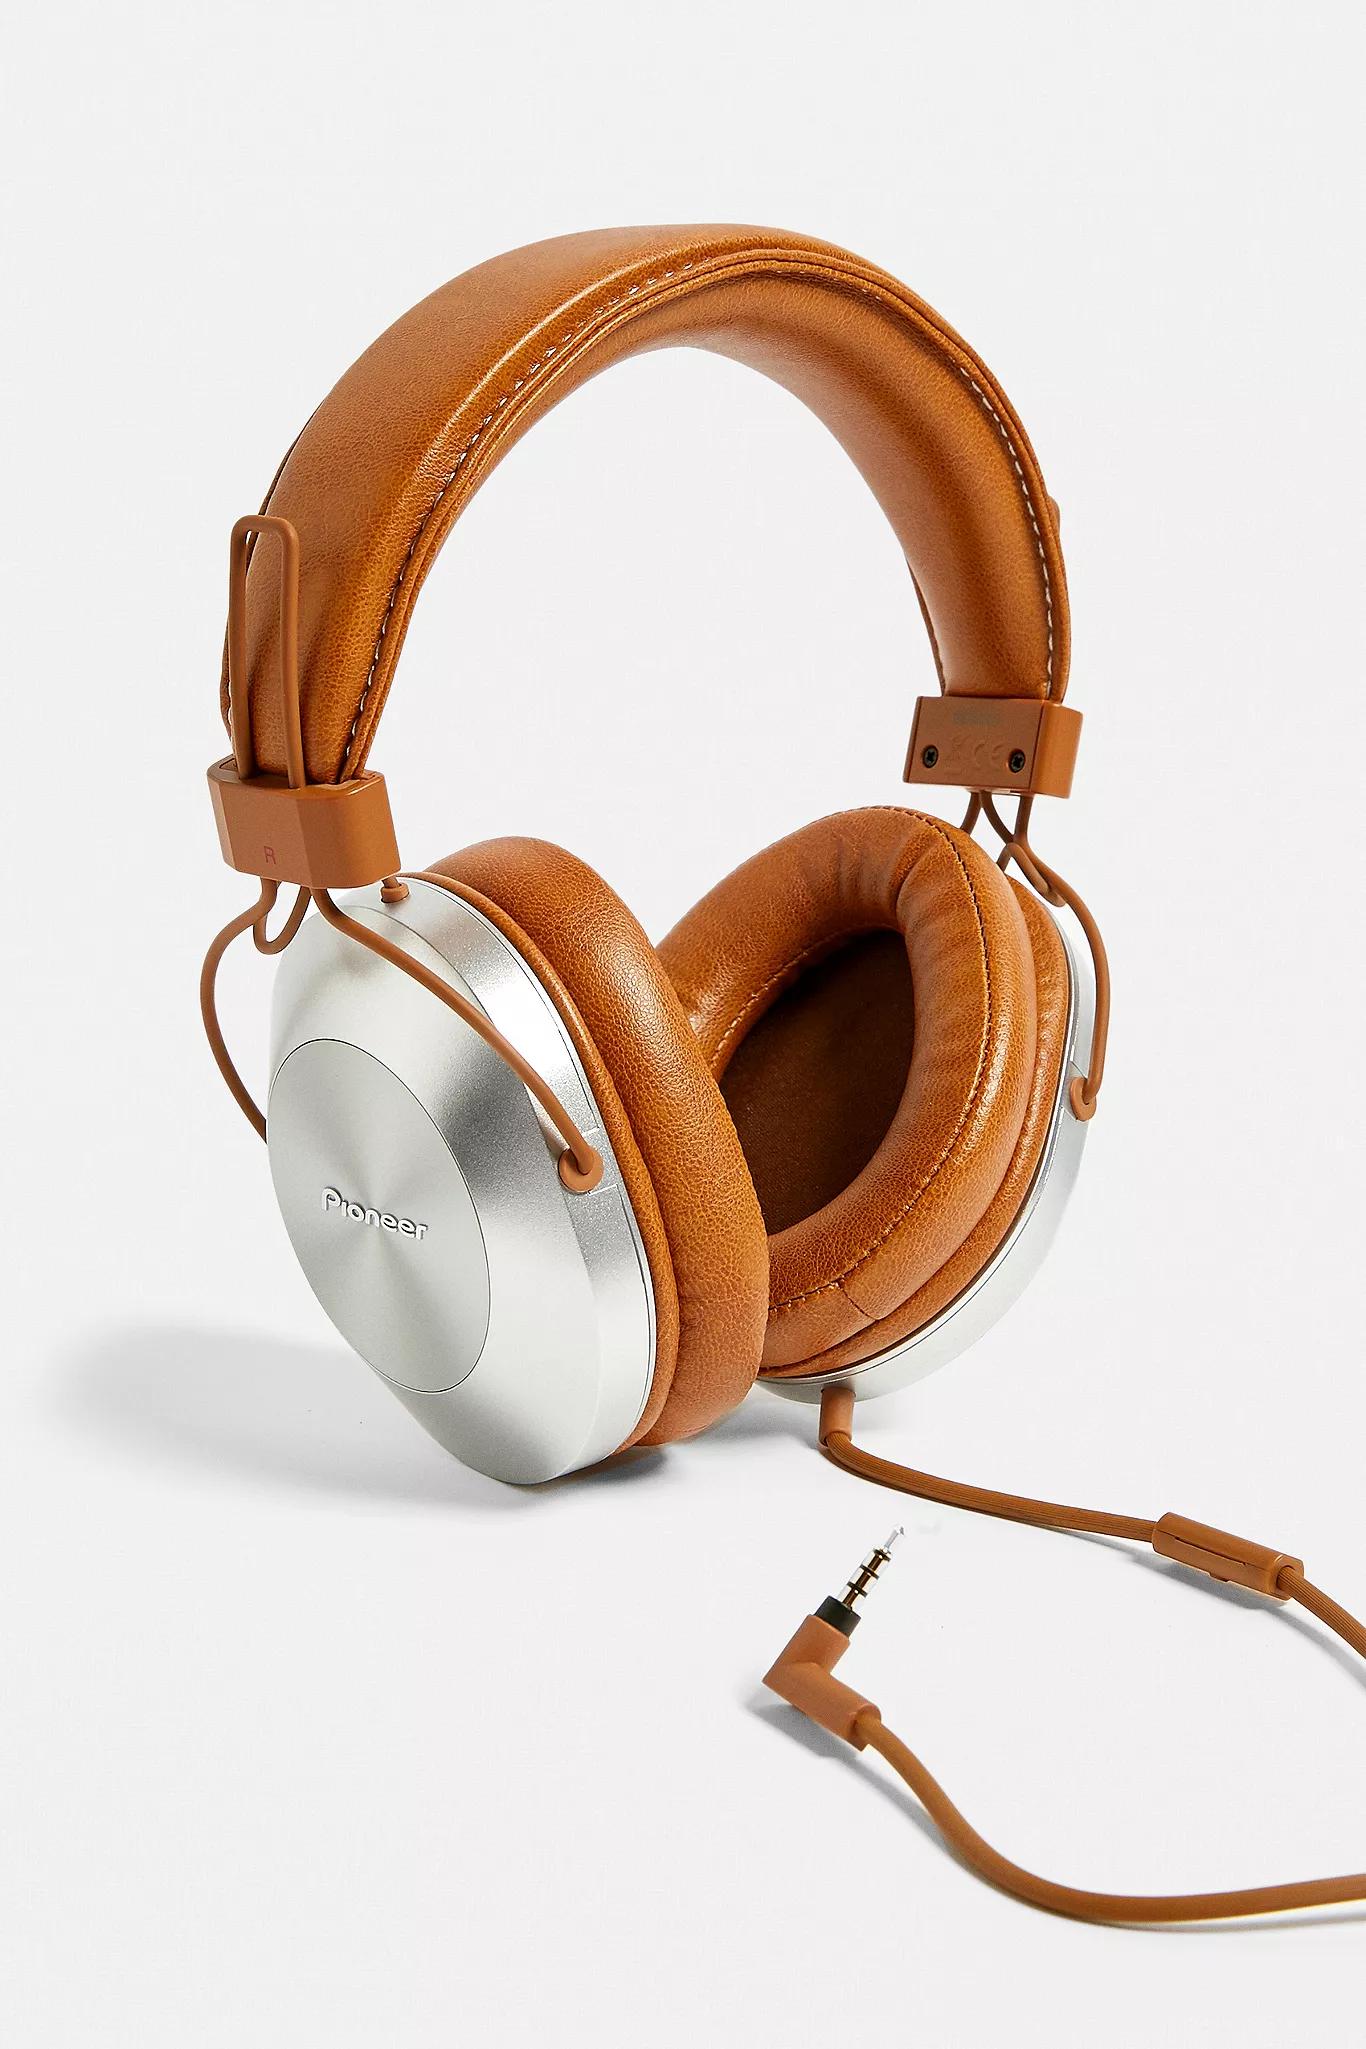 Pioneer DJ MS7BT Over-Ear Headphones £31 @ Urban Outfitters